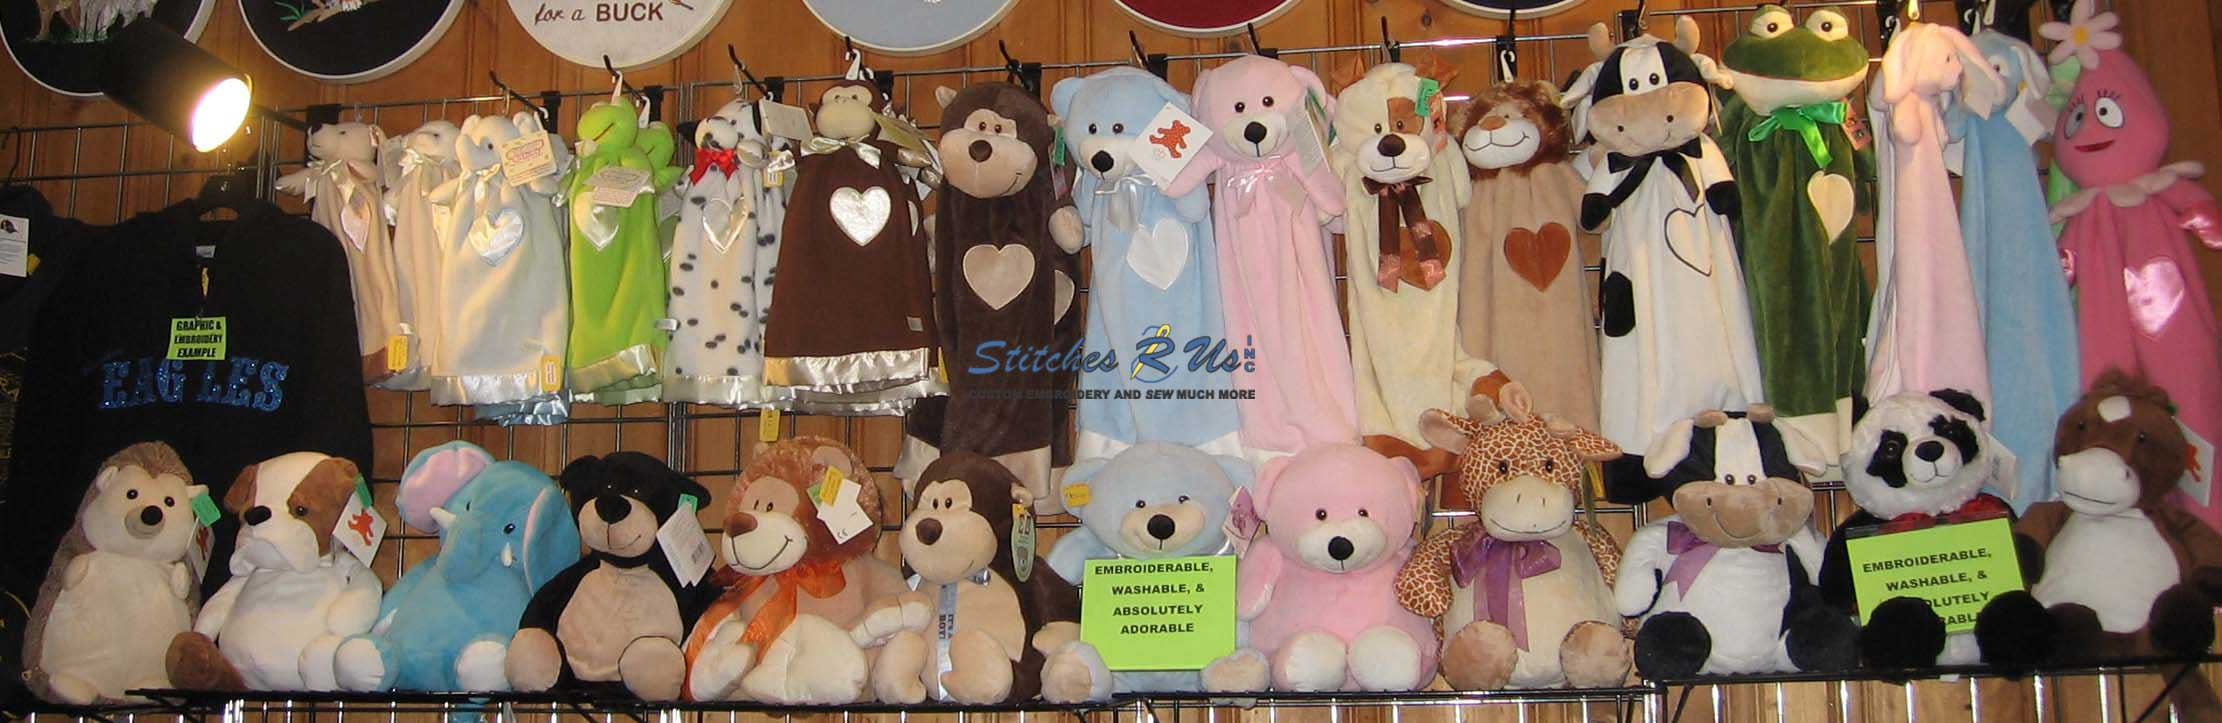 EmbroideredBuddies/EB-bears.jpg